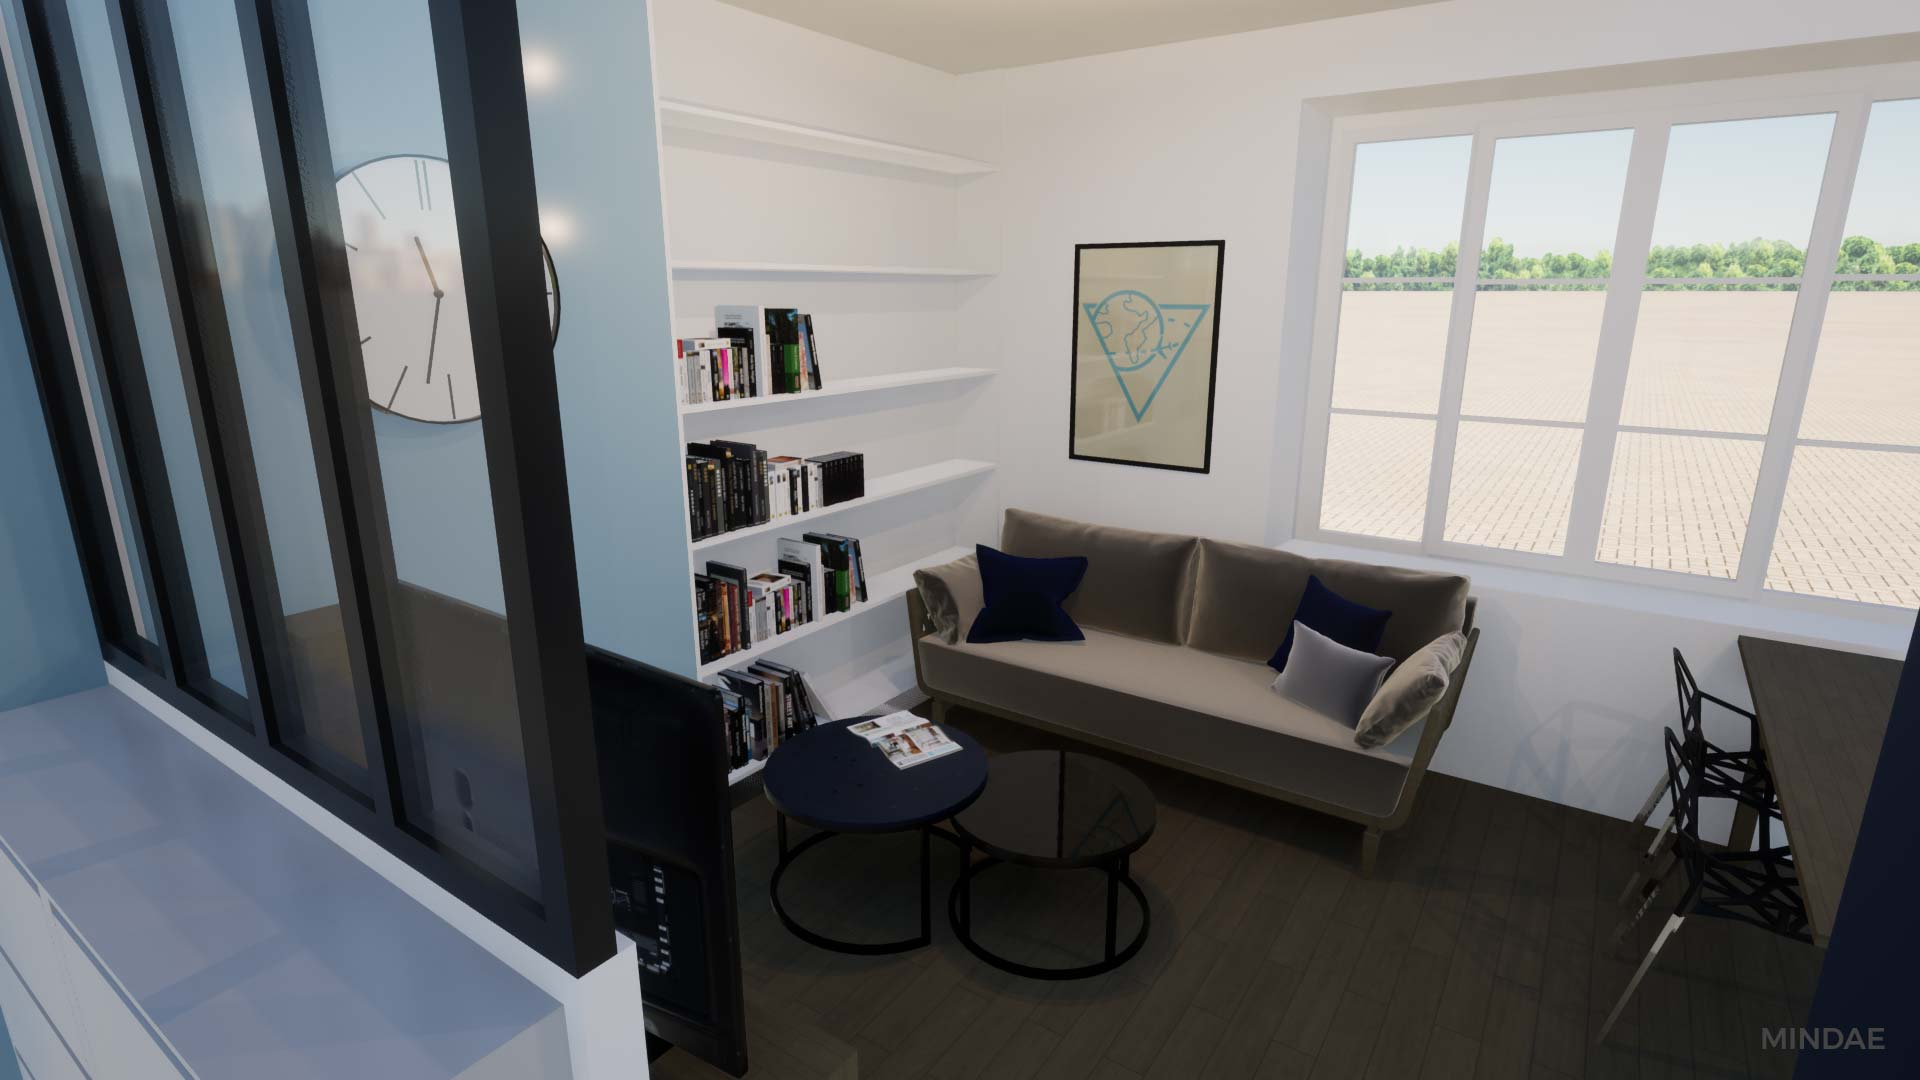 Mindae_3D_appartement_caen_saint_laurent_investisseur_colocation_airbnb_locatif_renovation_F2_F3-(2)